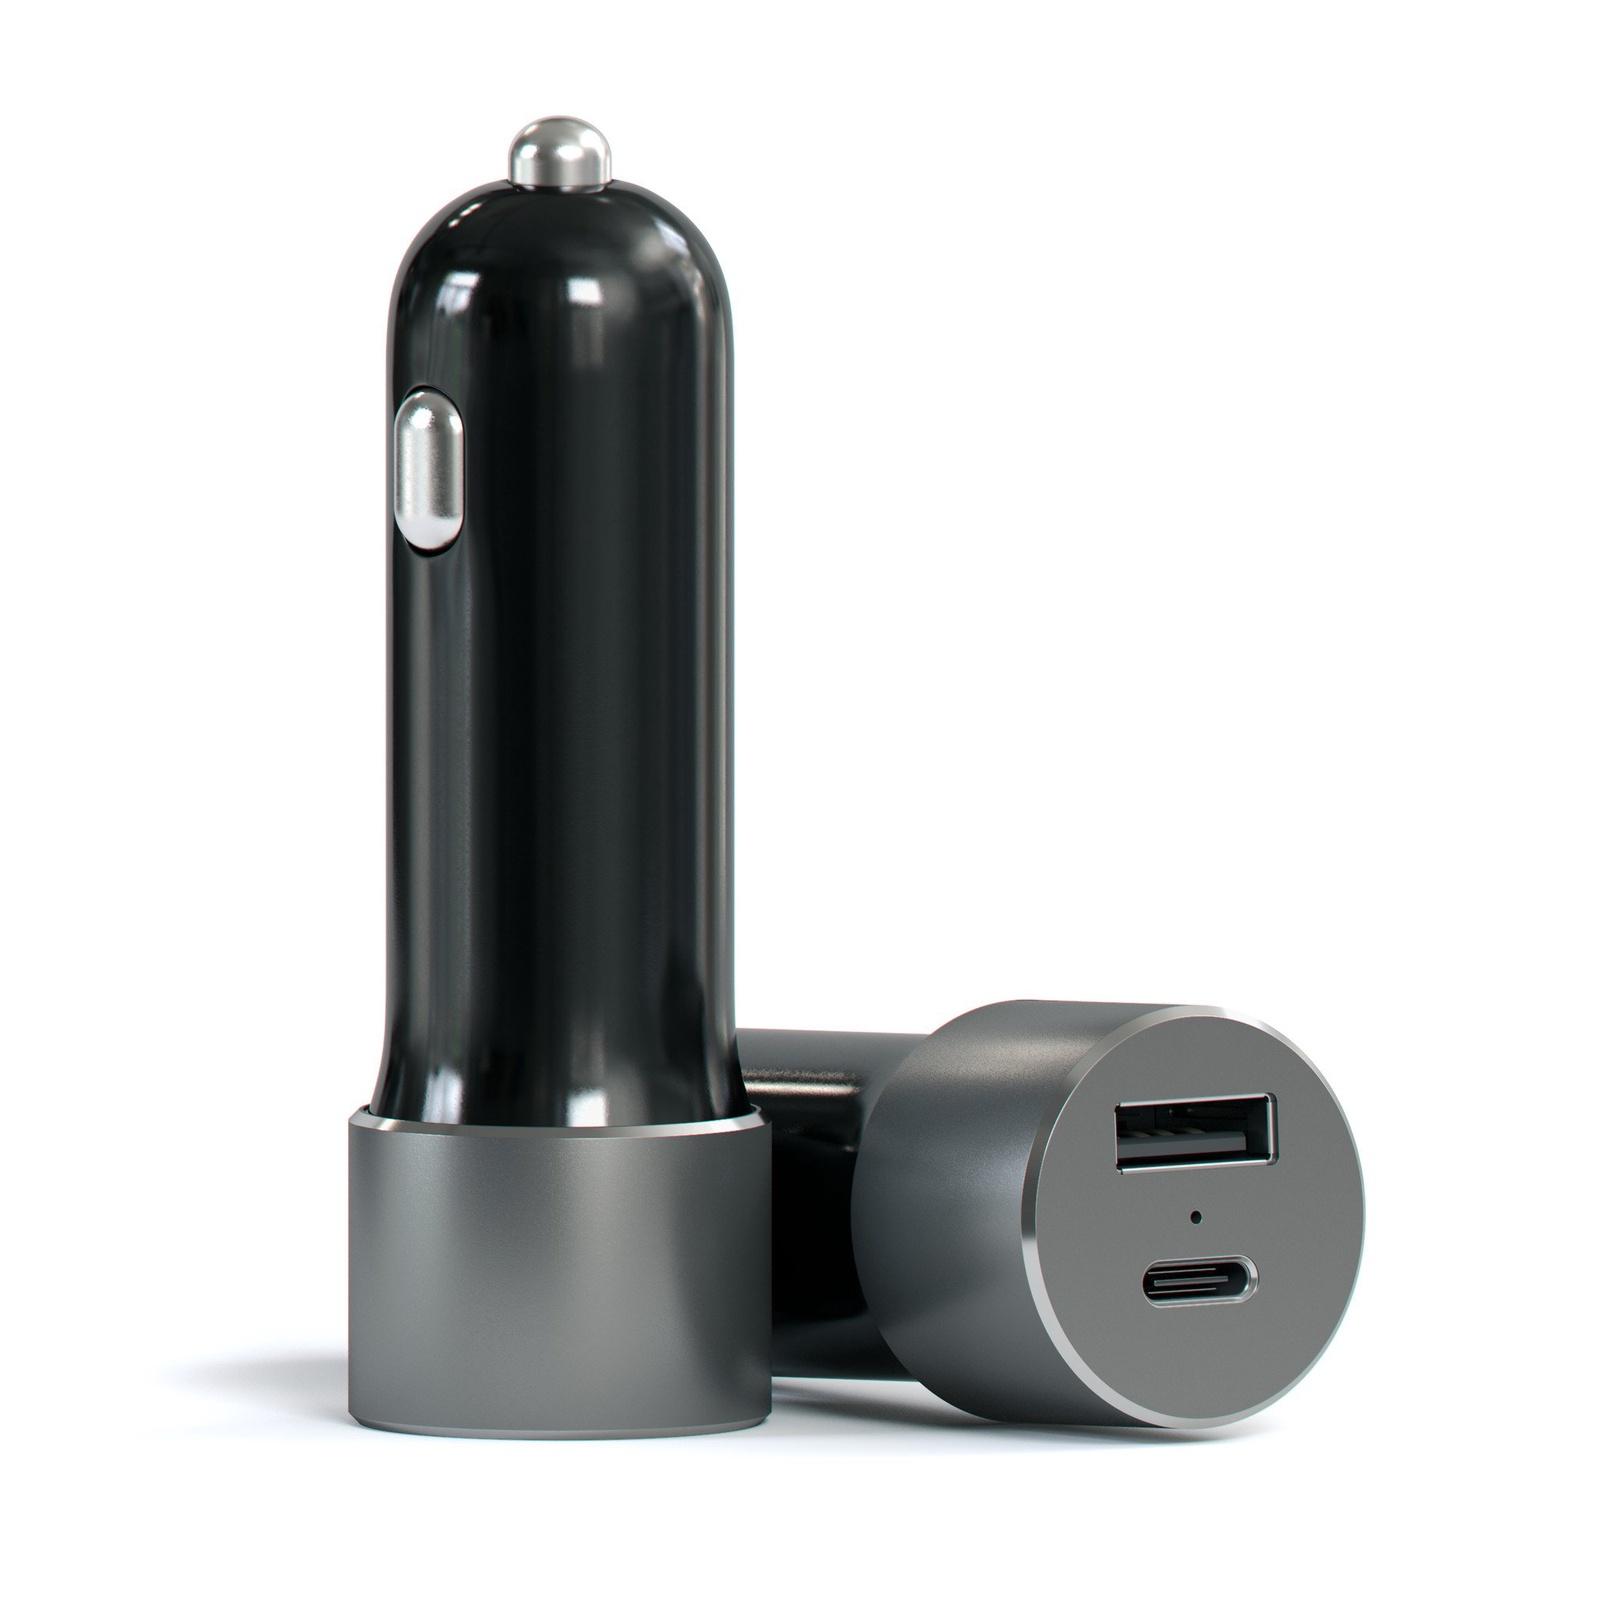 Автомобильное зарядное устройство Satechi 48W С Type C и USB (Серый) автомобильное зарядное устройство nillkin celerity car charger 6 4а 2 х usb usb c серый